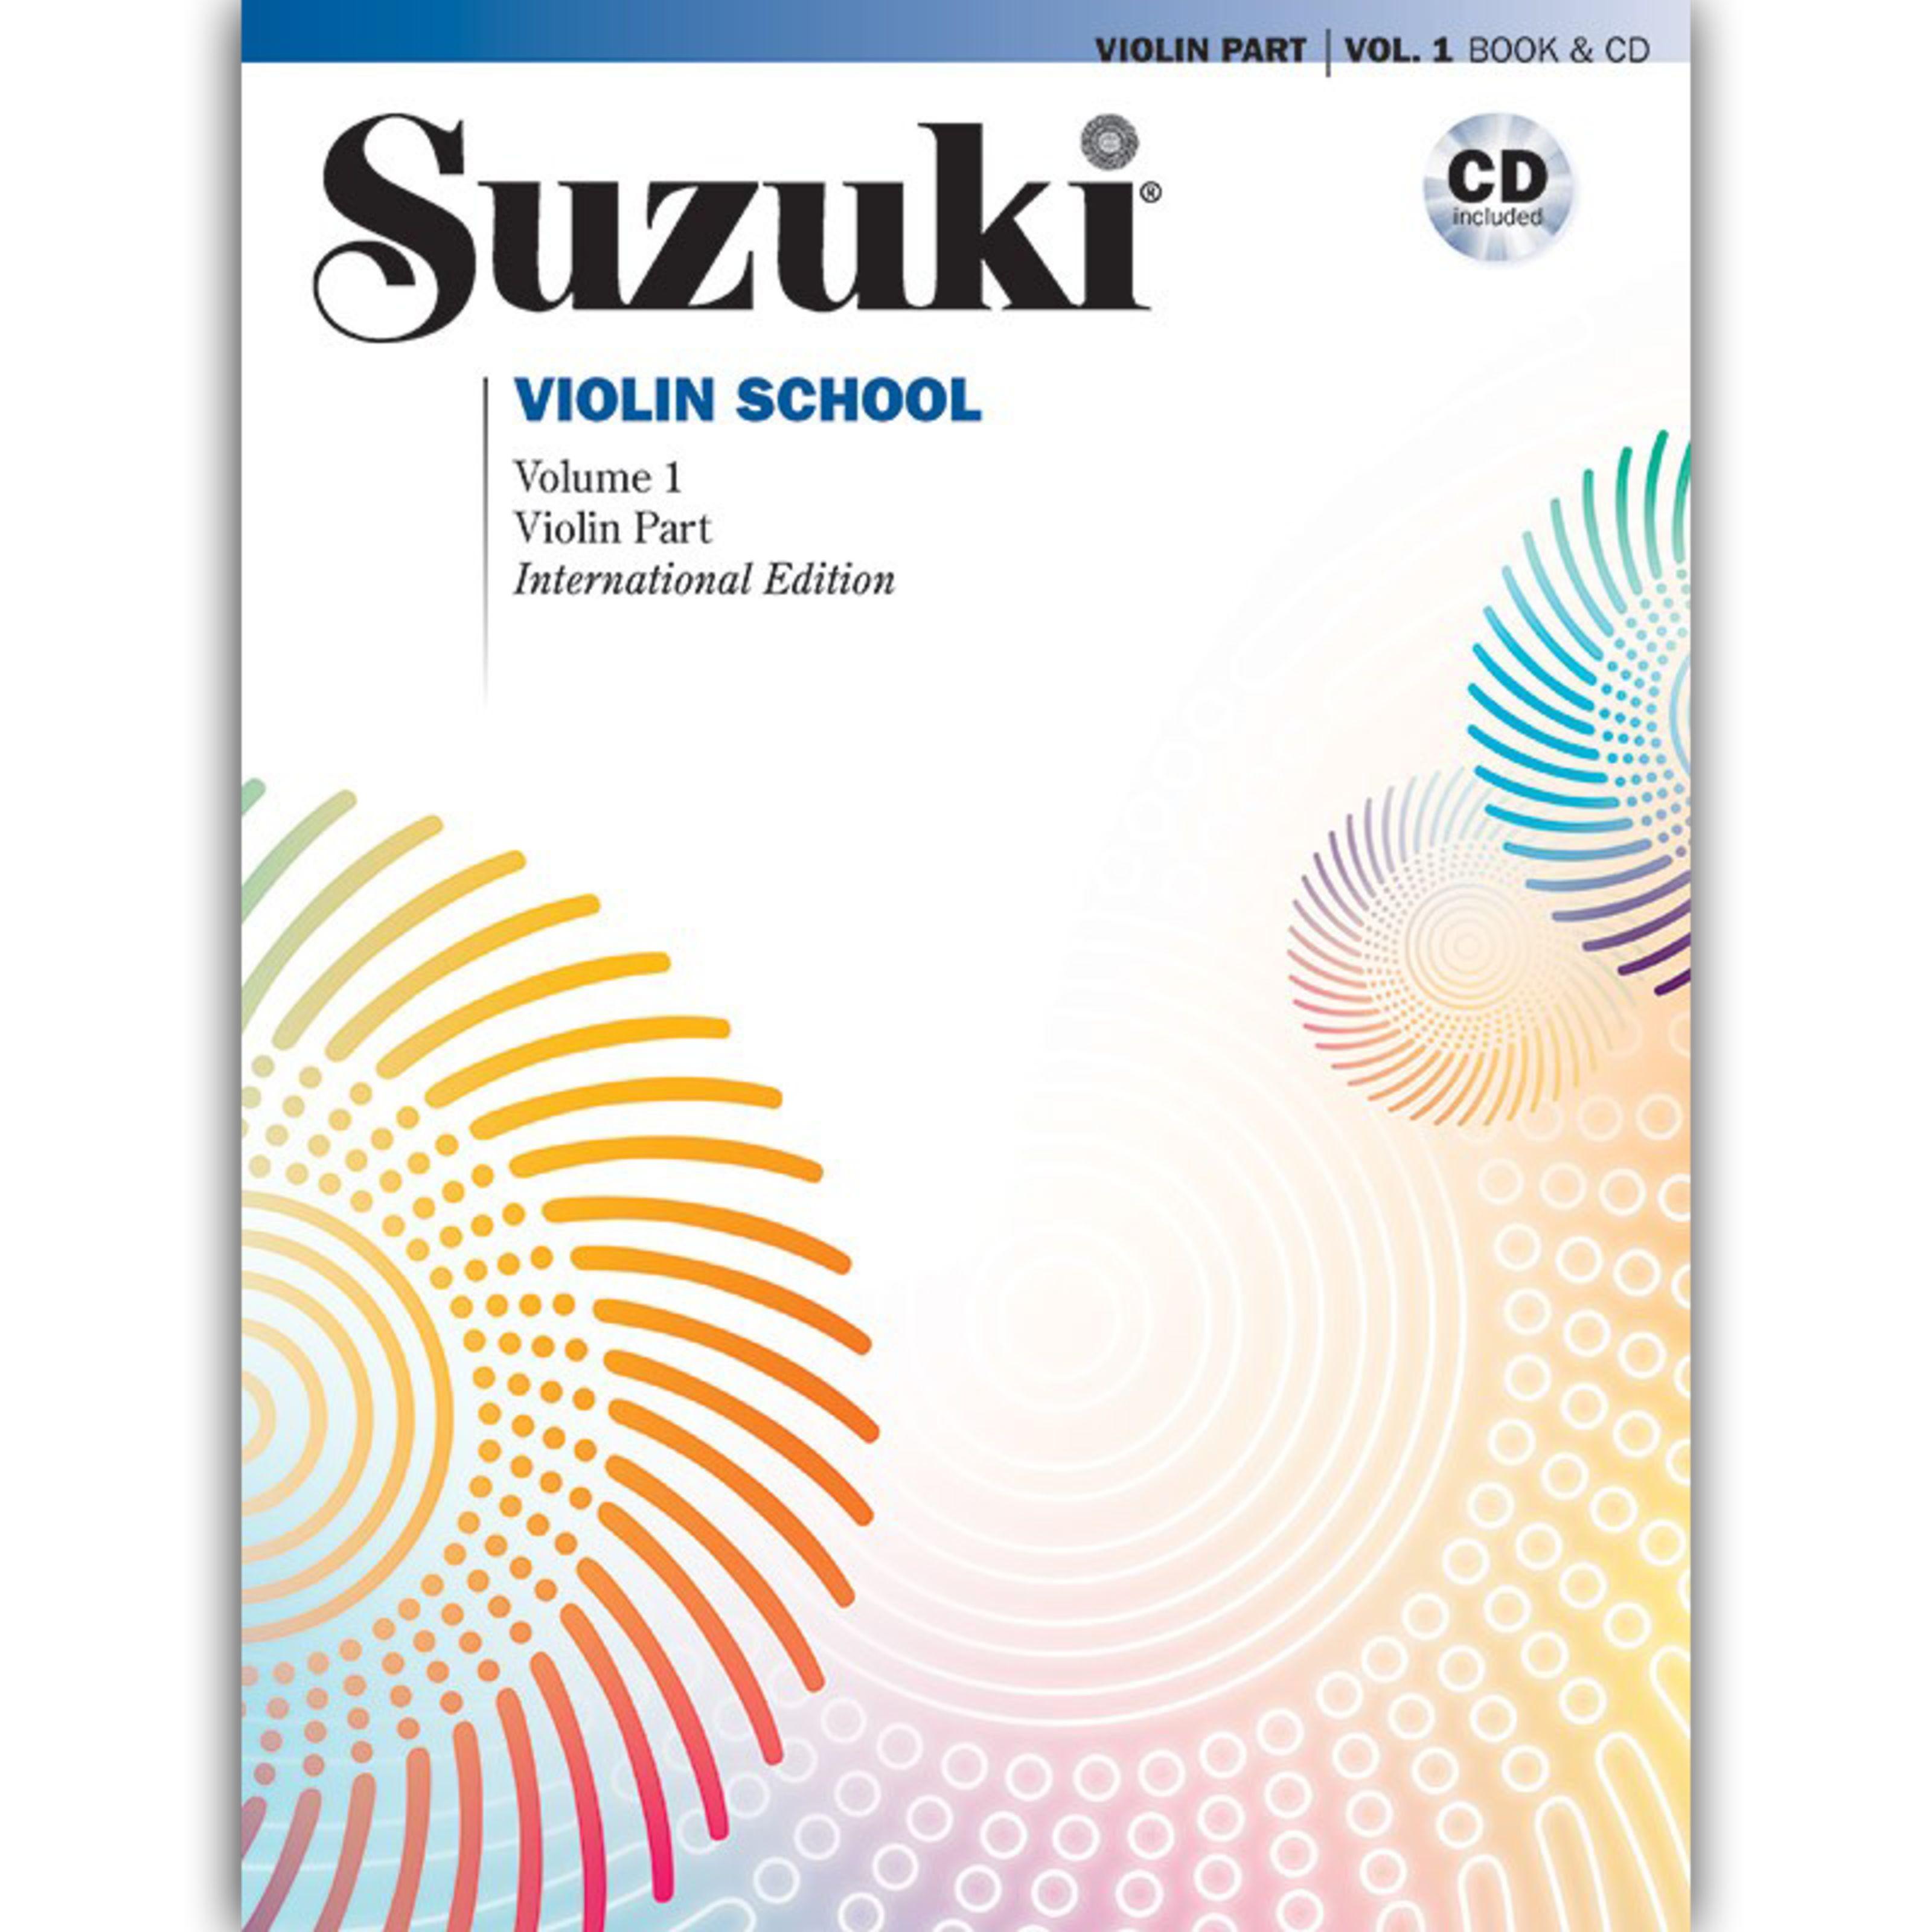 Alfred Music - Suzuki Violin School 1 00-46910